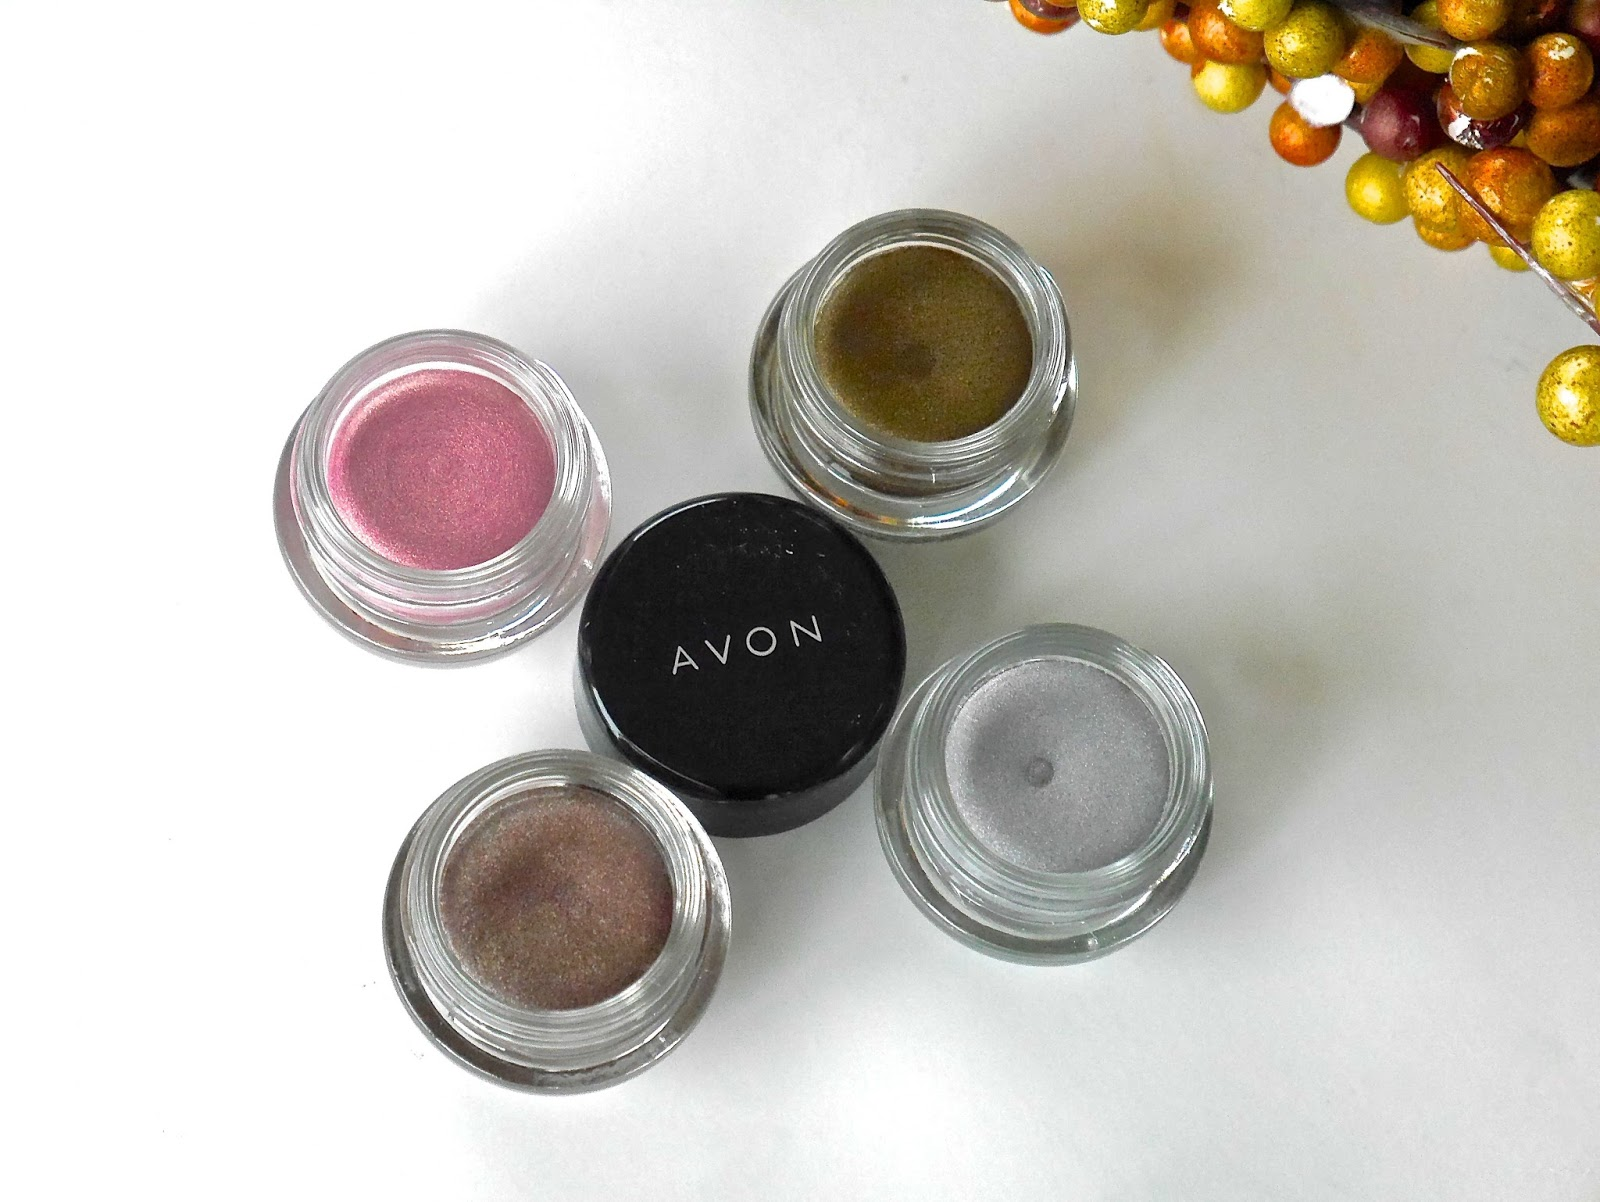 nail polish, metals, cream eyeshadow, pencil eyeliners